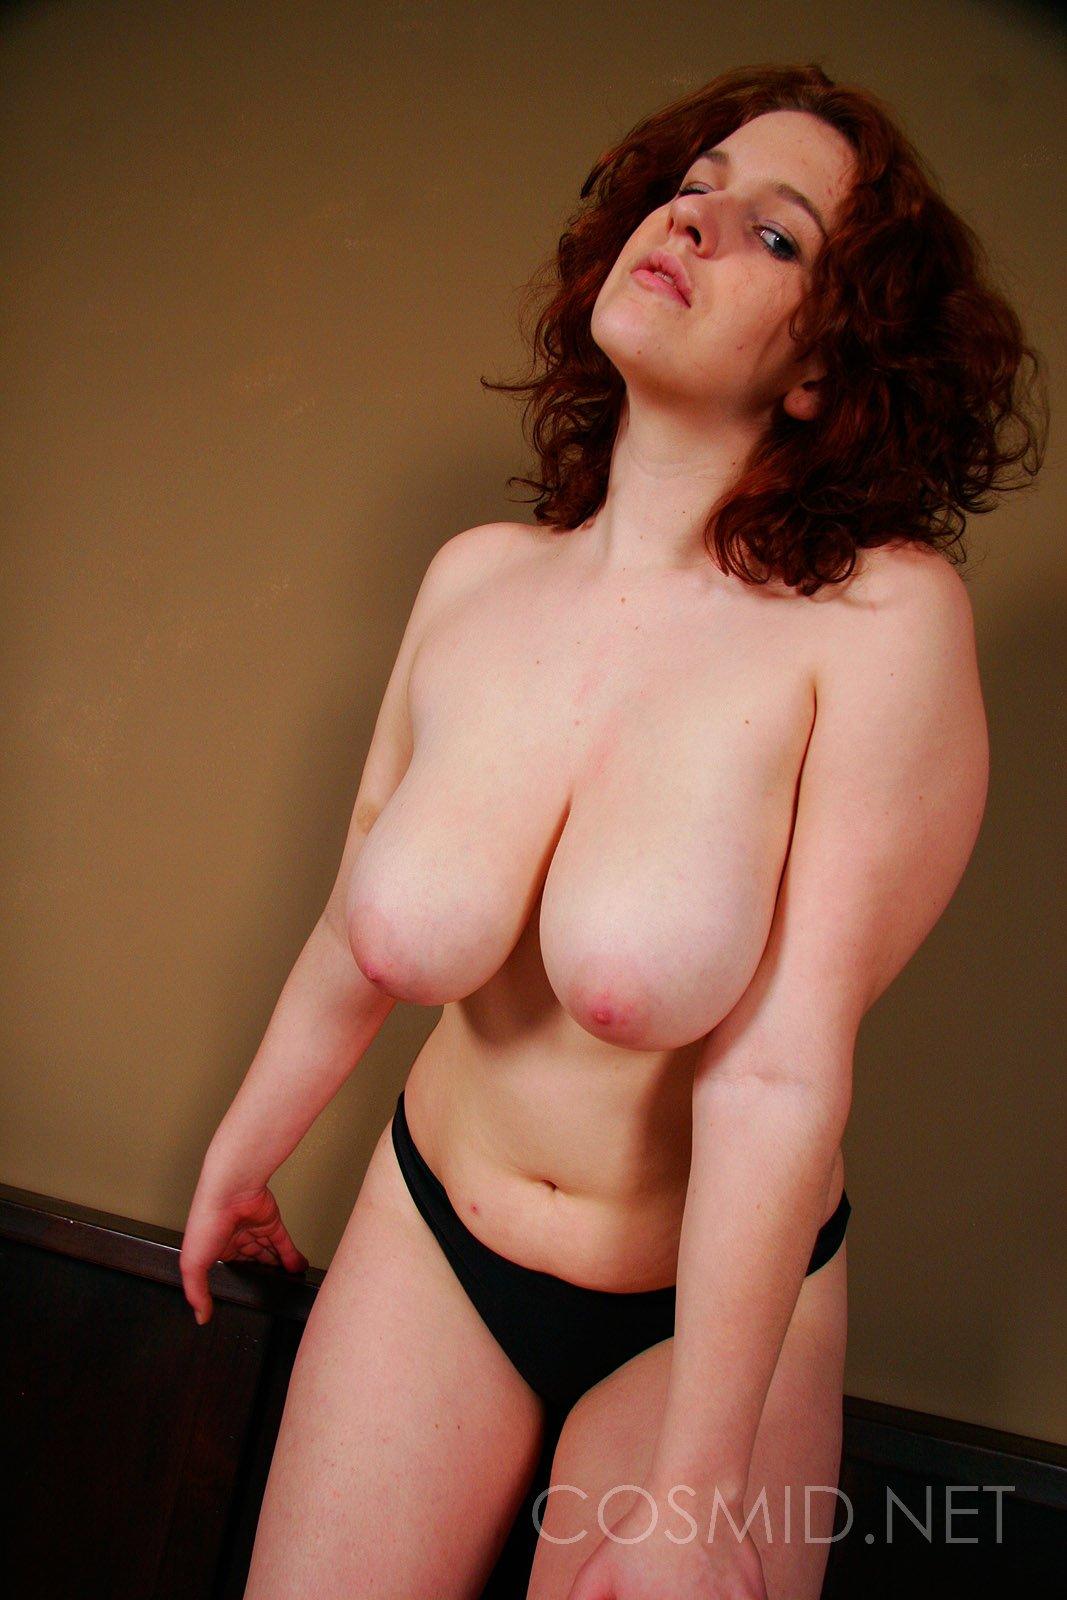 Voluptous busty redhead pics